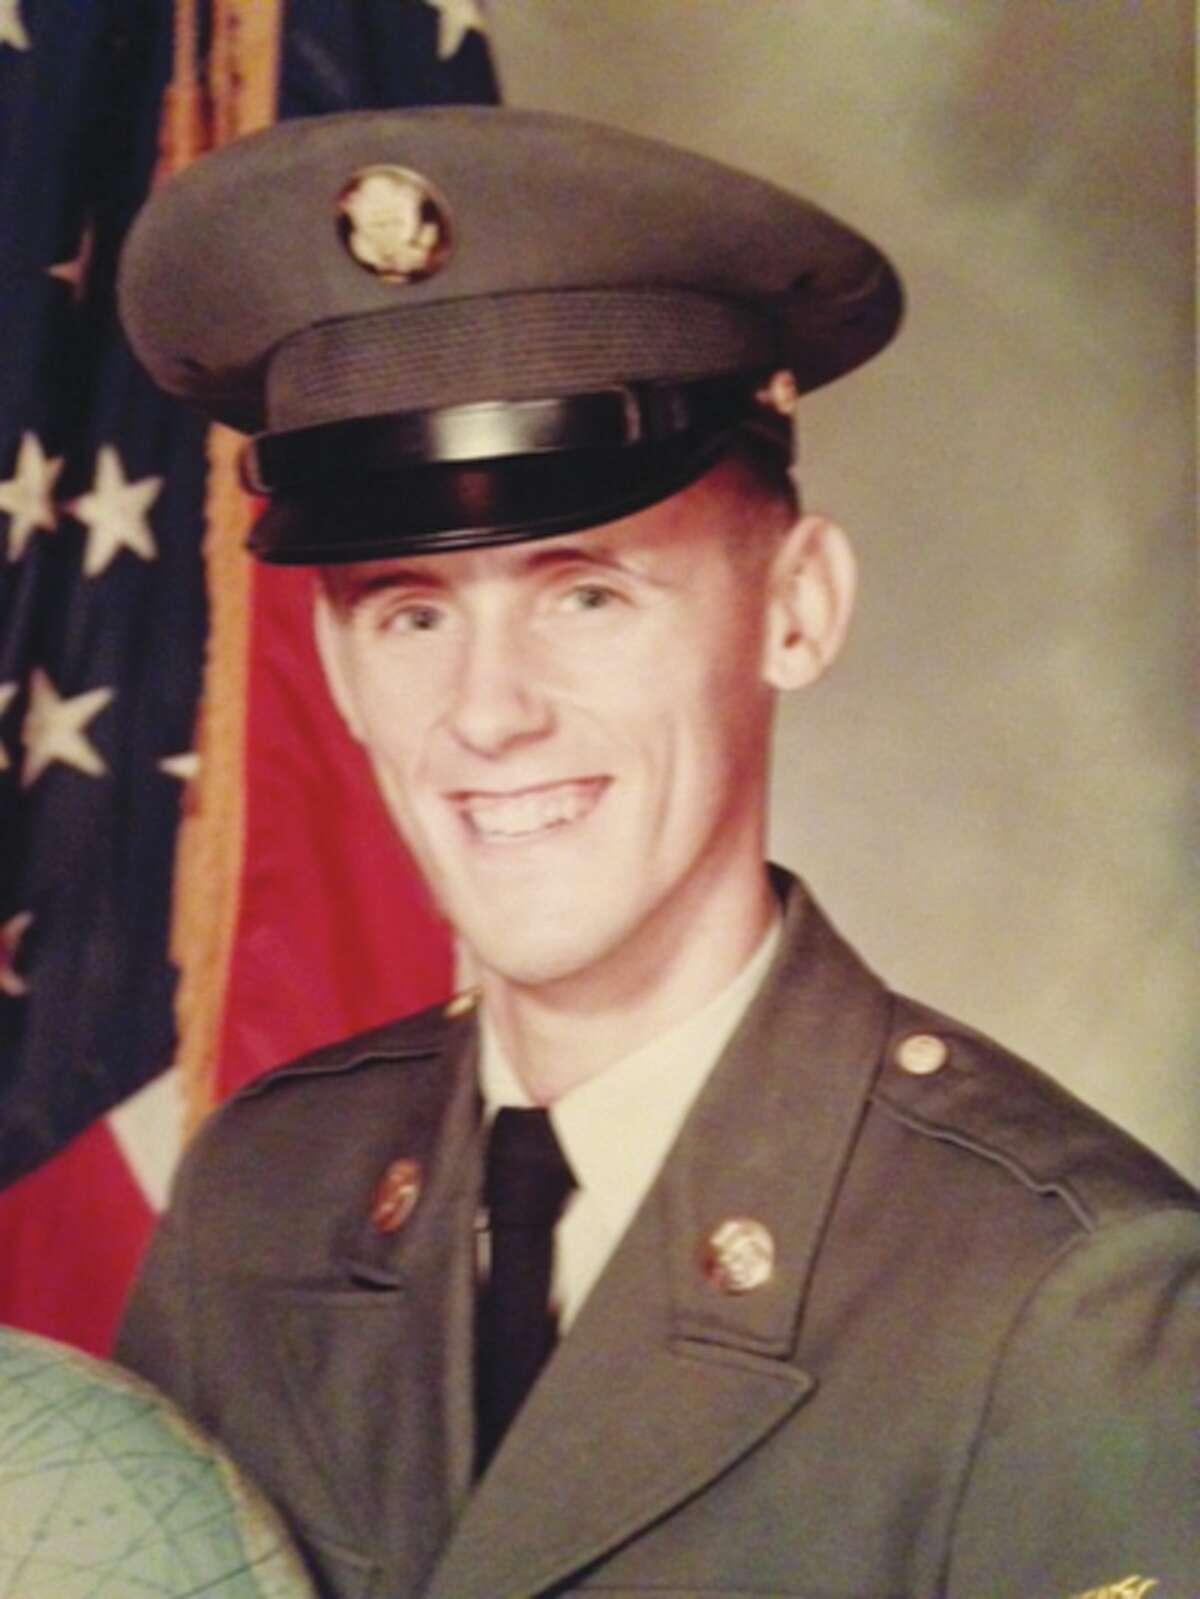 Rick Thebo, SP4, U.S. Army